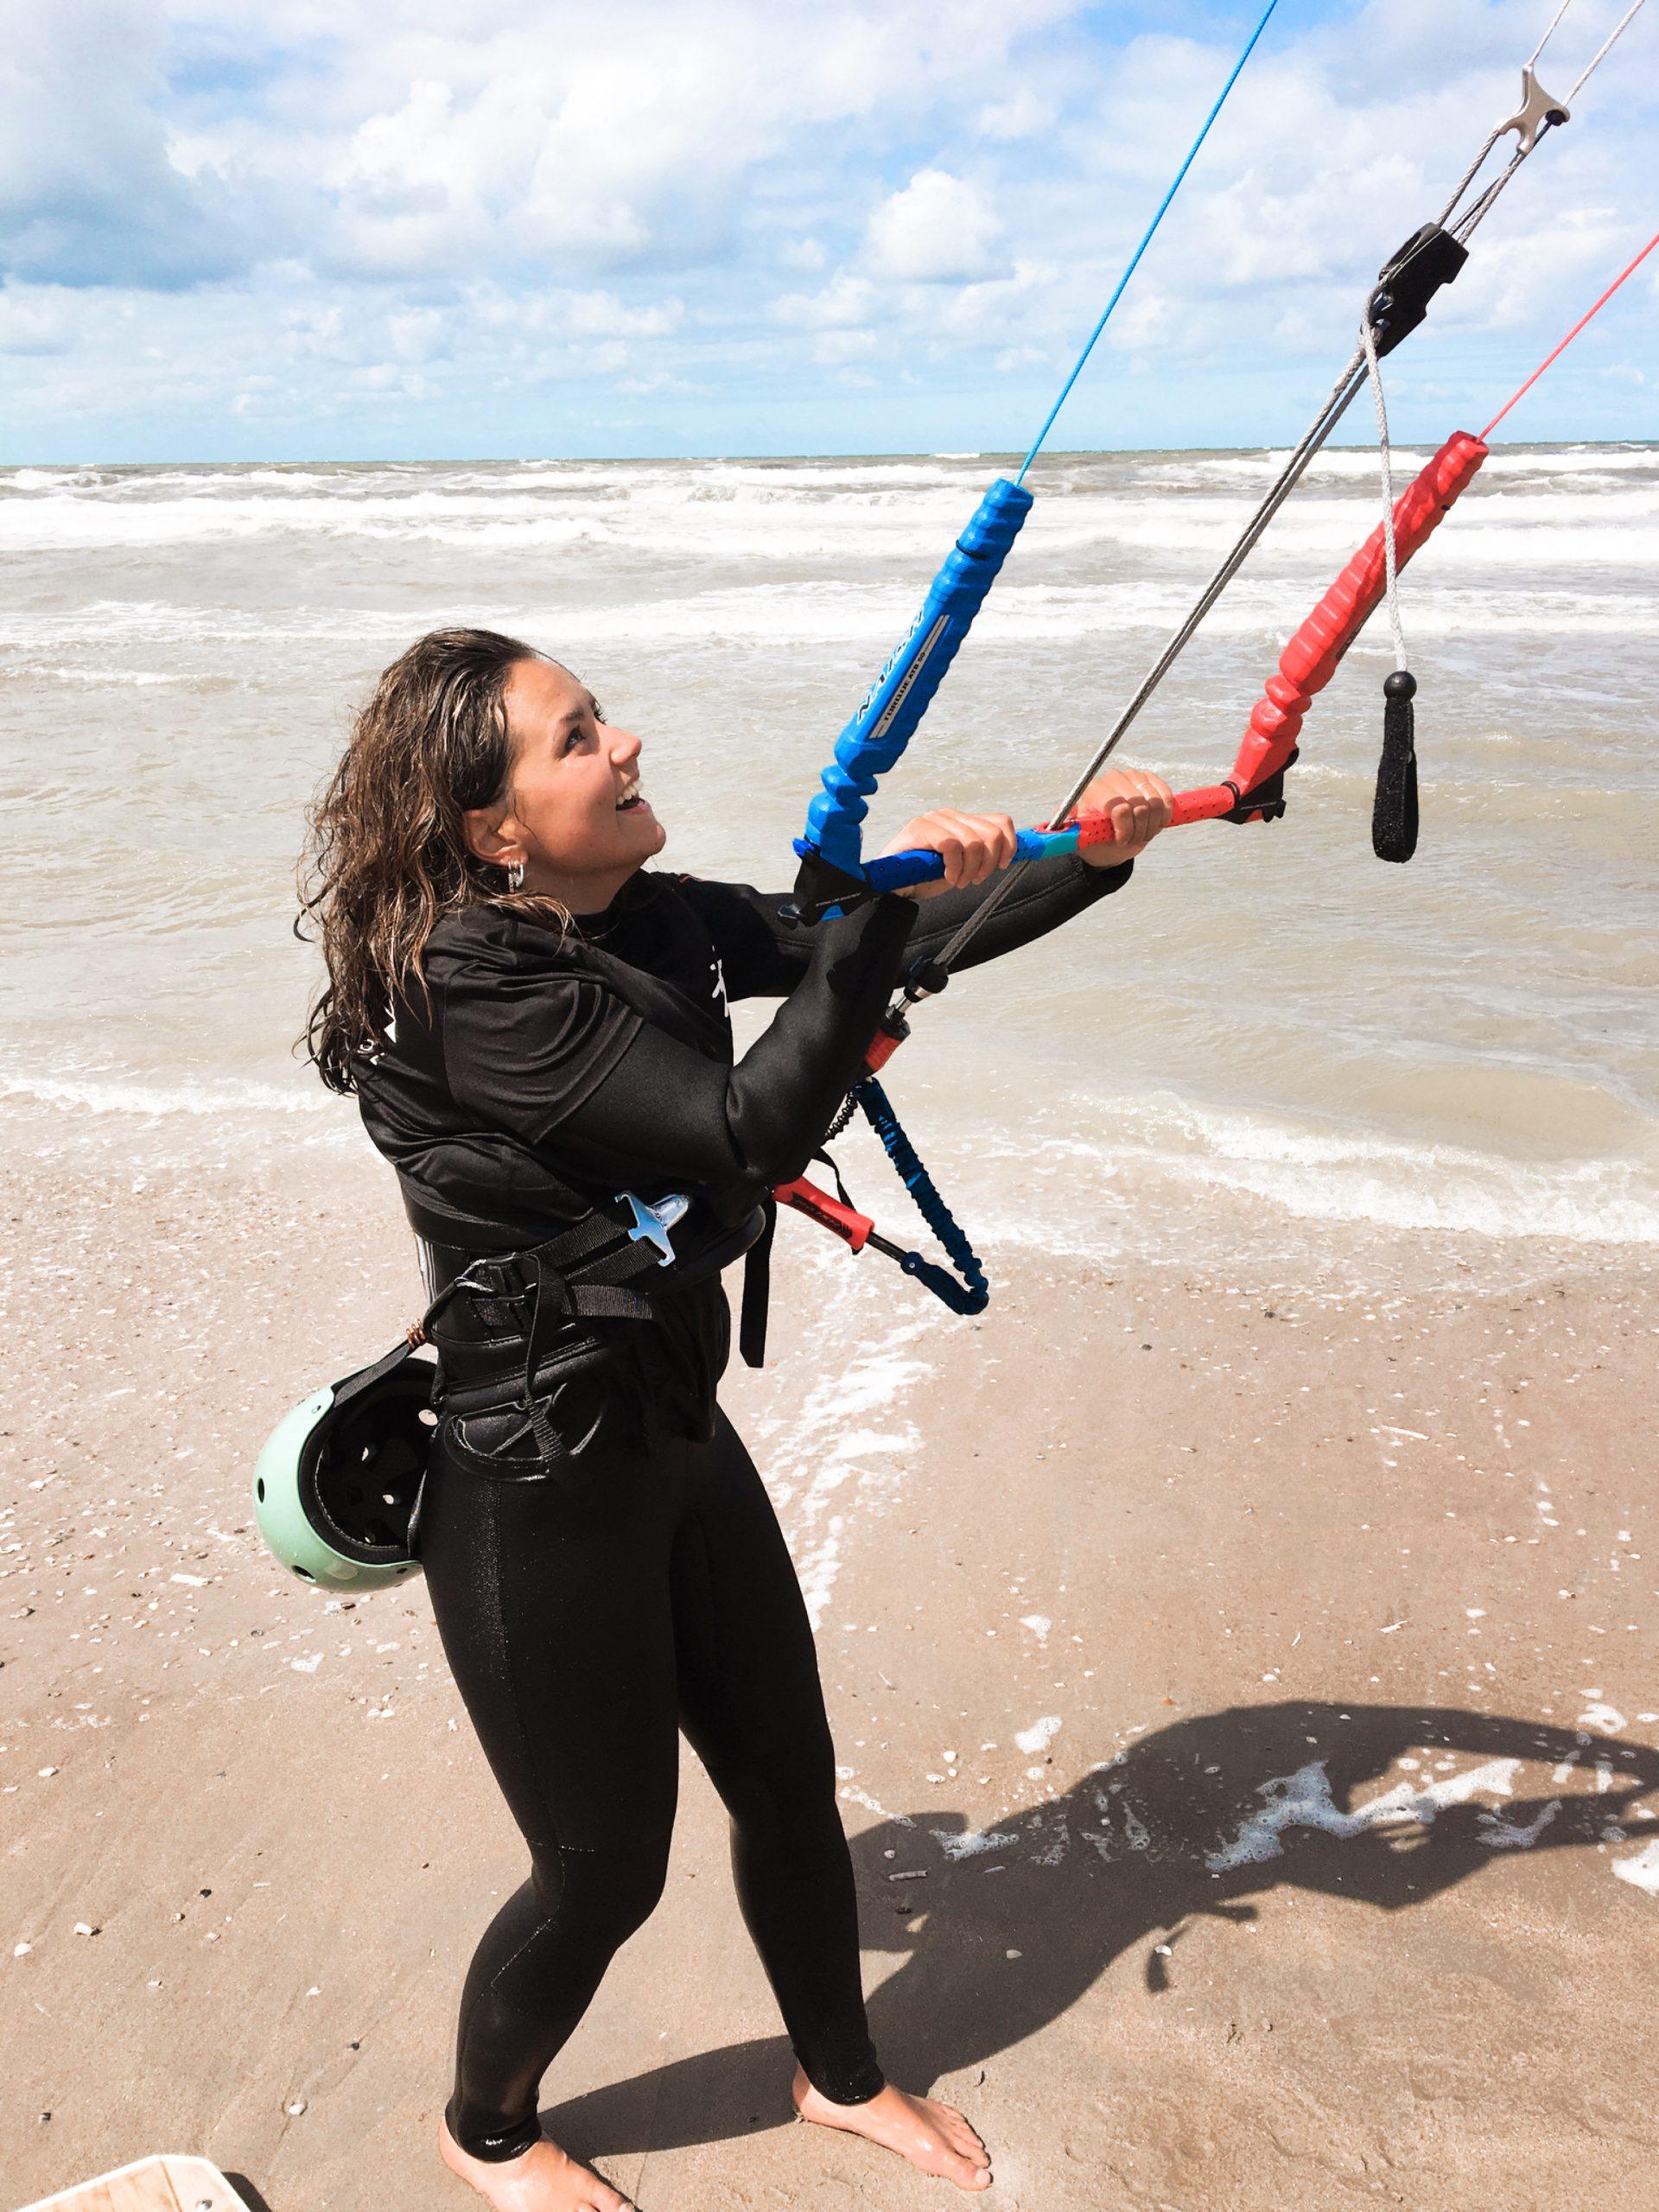 kitesurf cursus prive bij moana in zandvoort